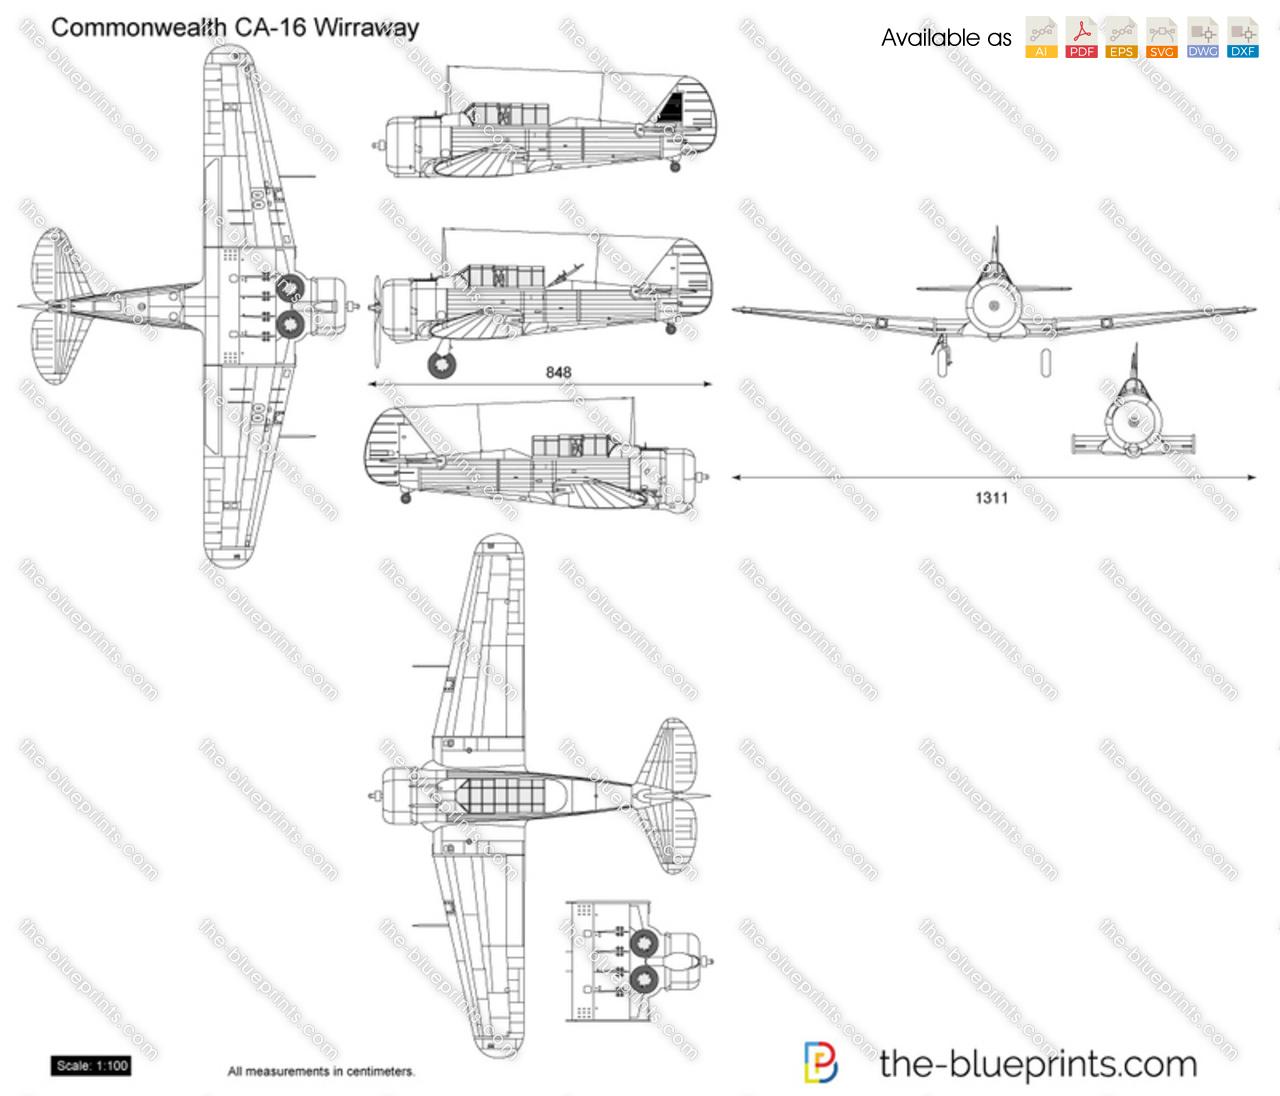 Commonwealth CA-16 Wirraway